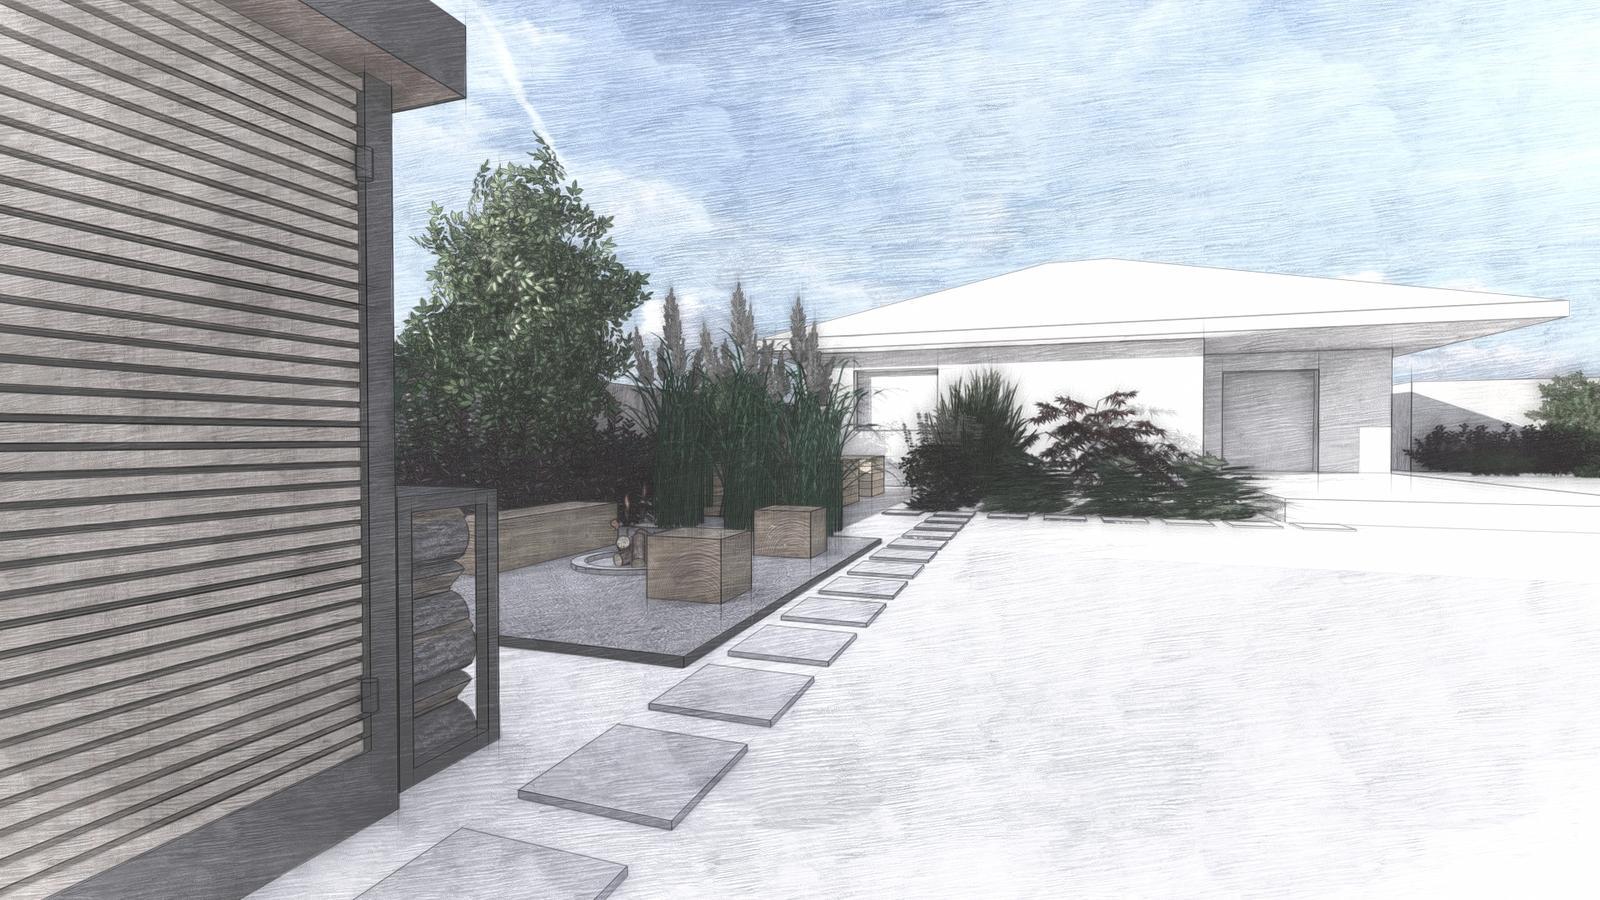 Návrh záhrady rodinného domu - Obrázok č. 5